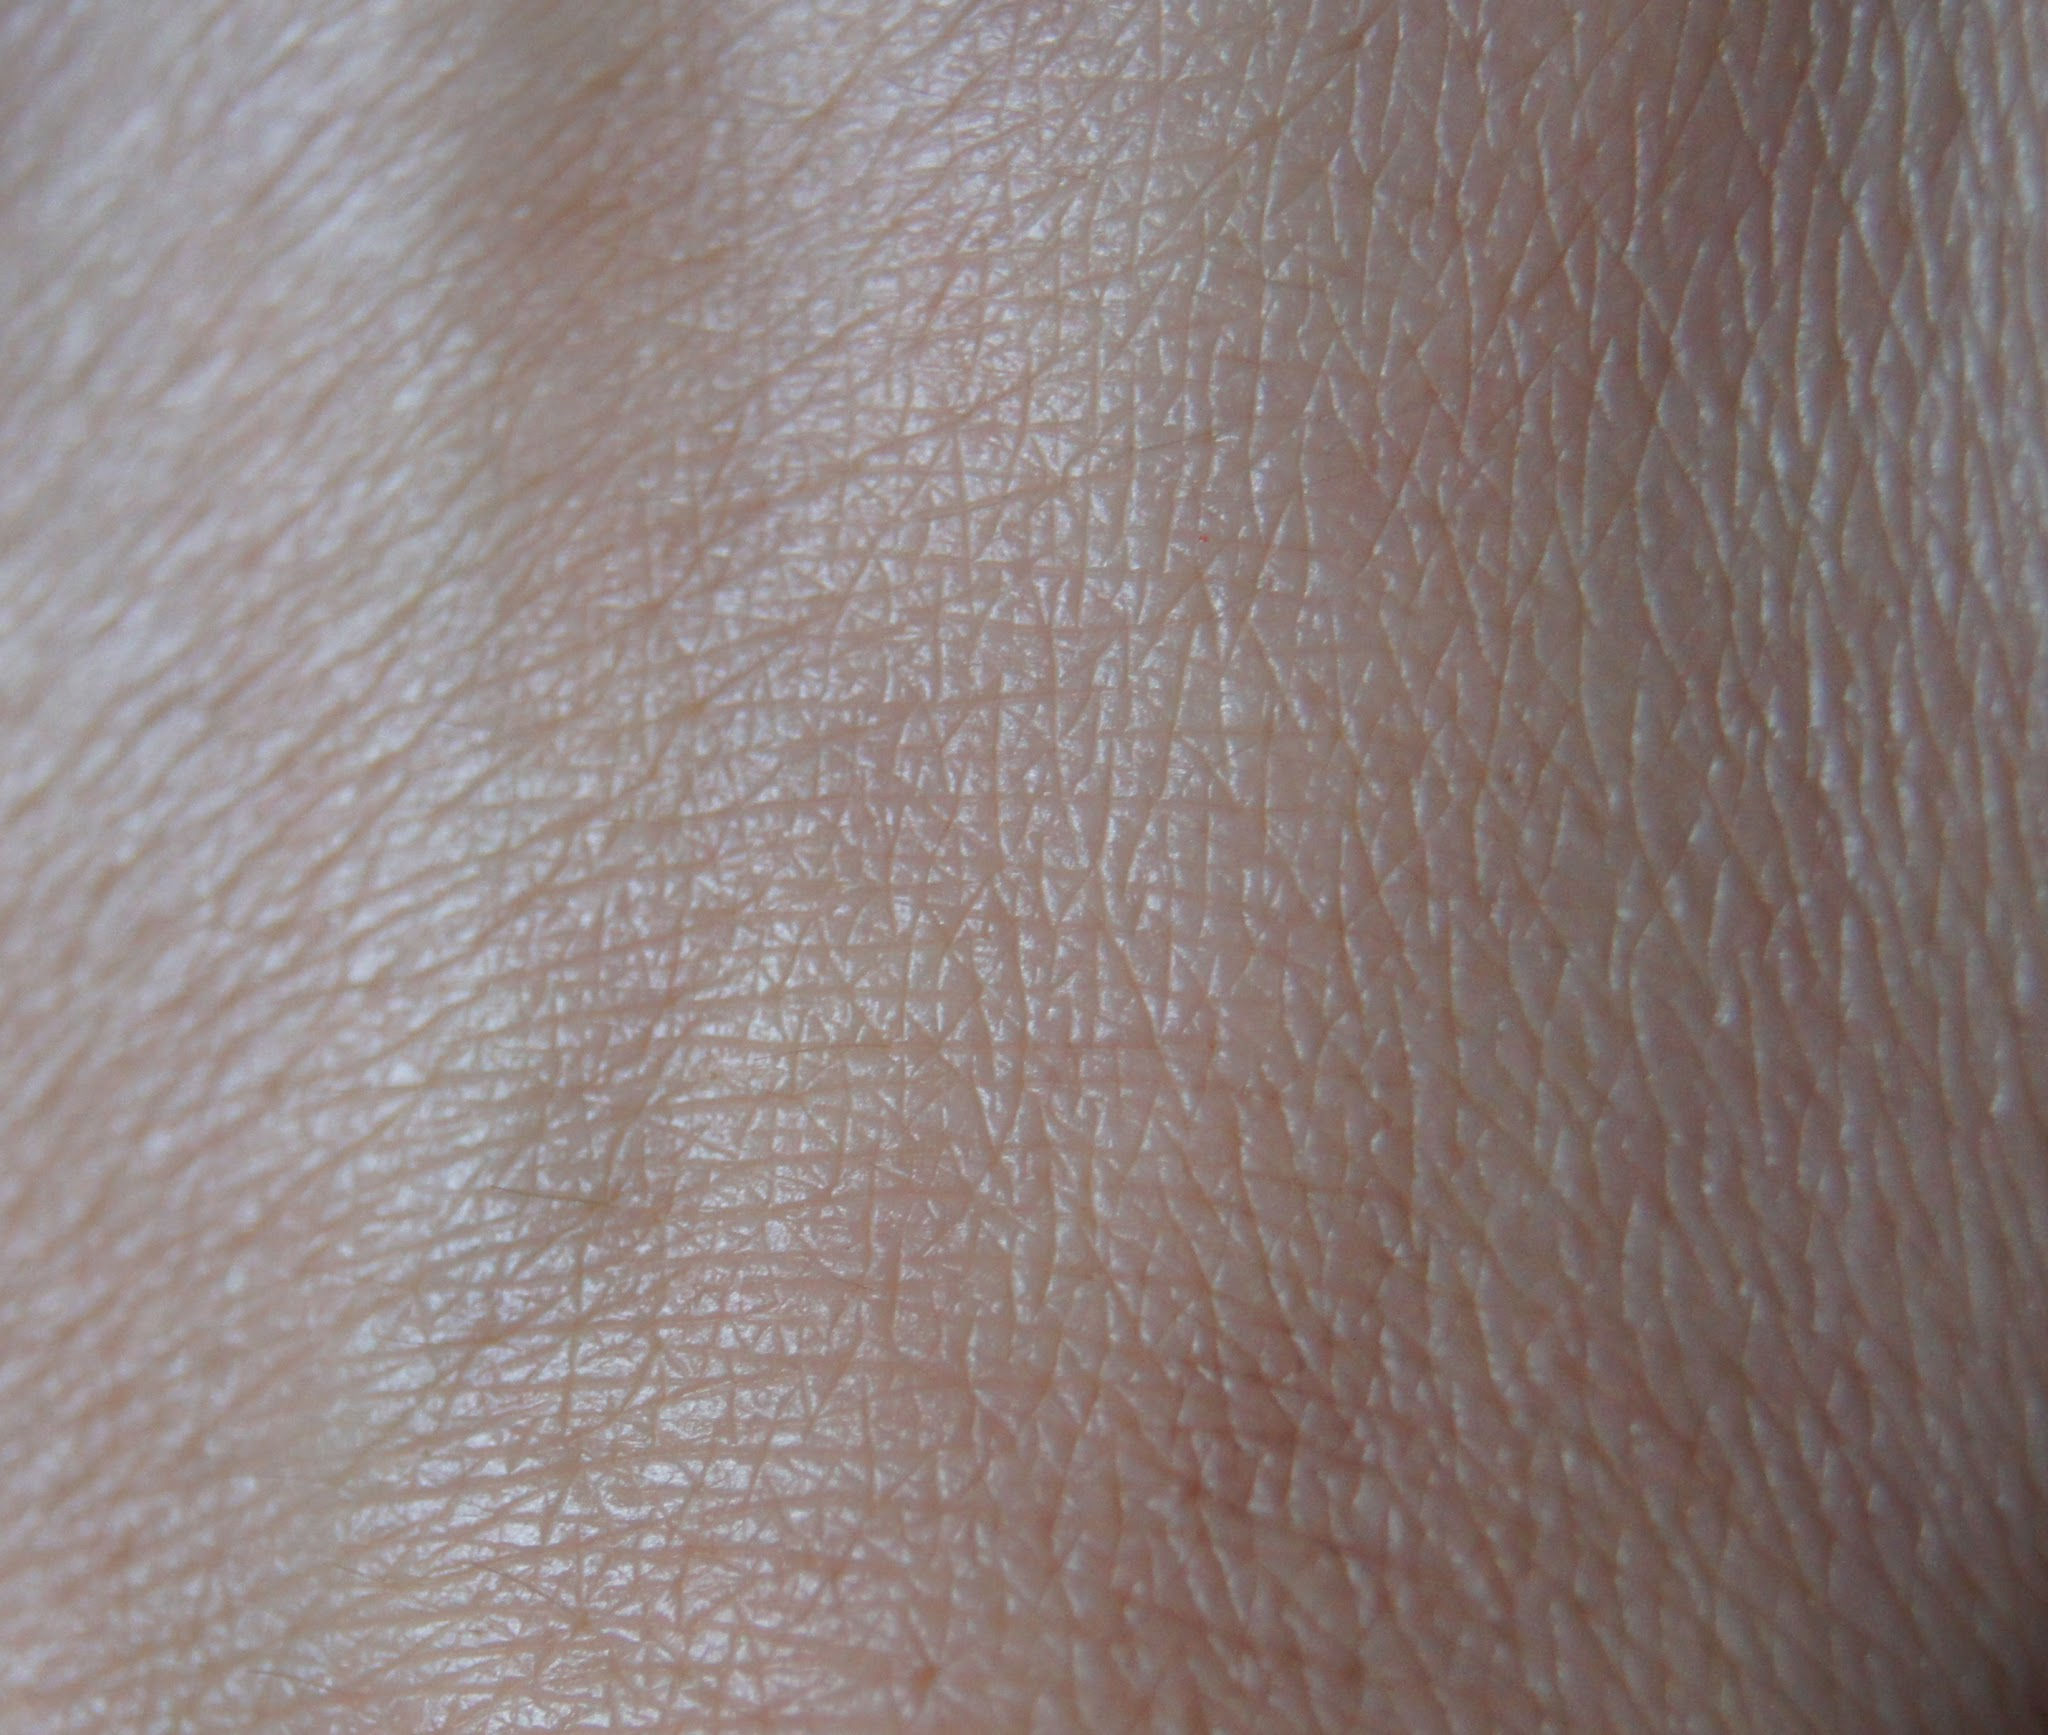 laura mercier oil free tinted moisturizer nude swatch